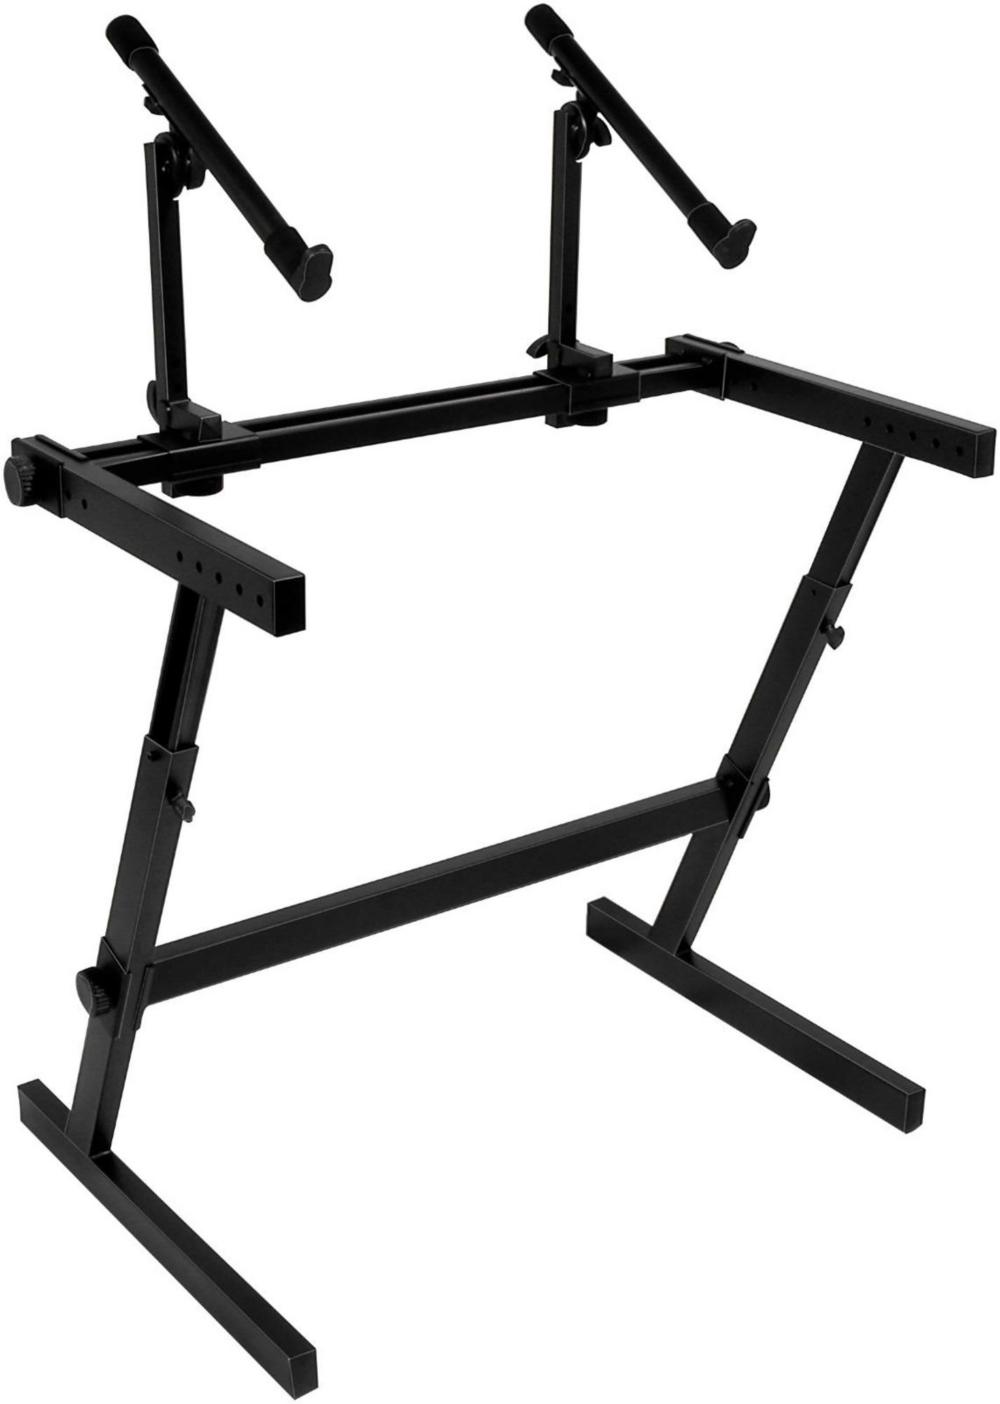 Quik-Lok 2 Tier Keyboard Stand by Quik-Lok